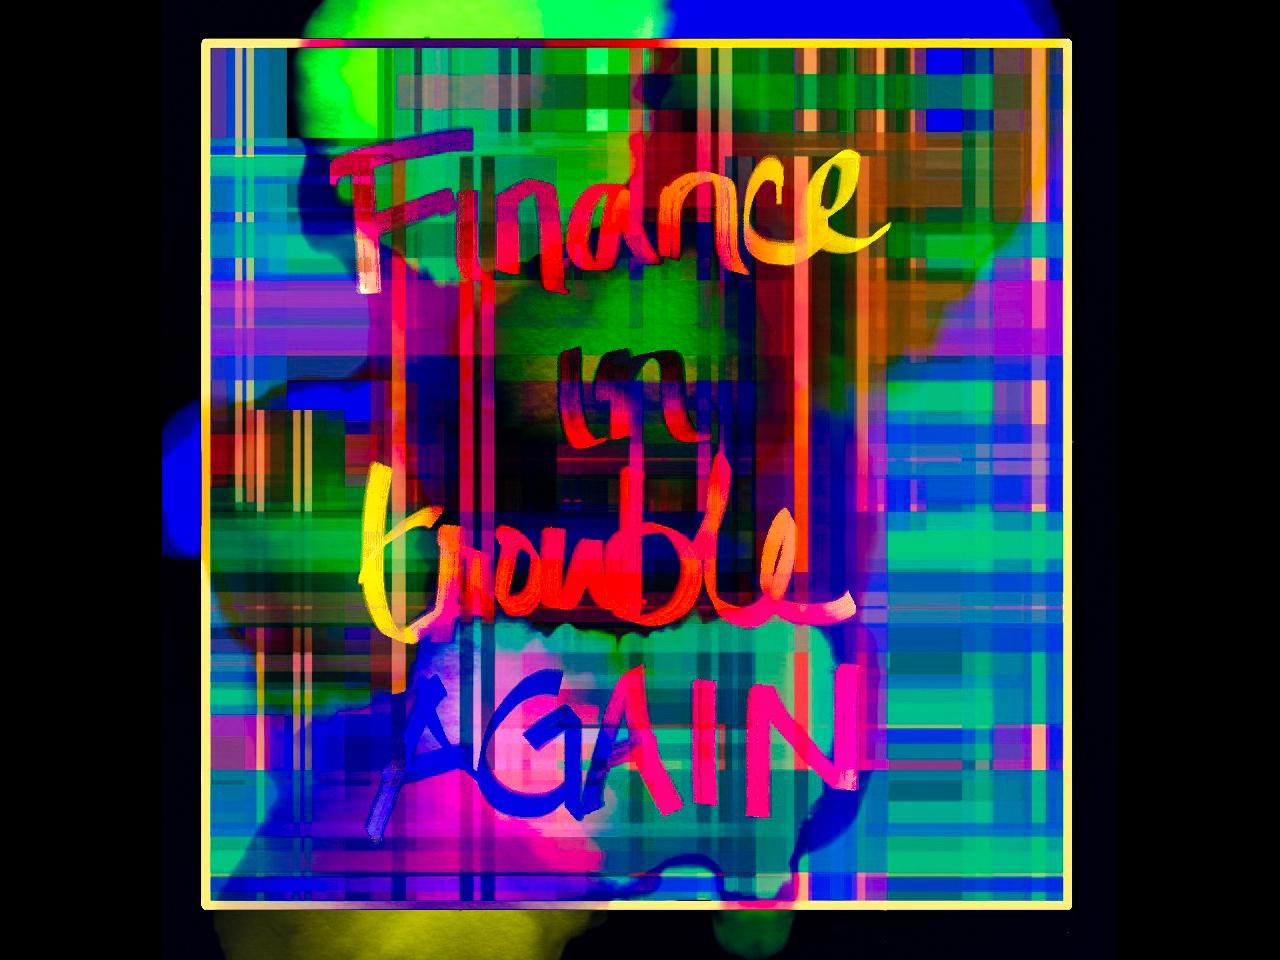 Another Bad Behavior from Finance - Wells Fargo